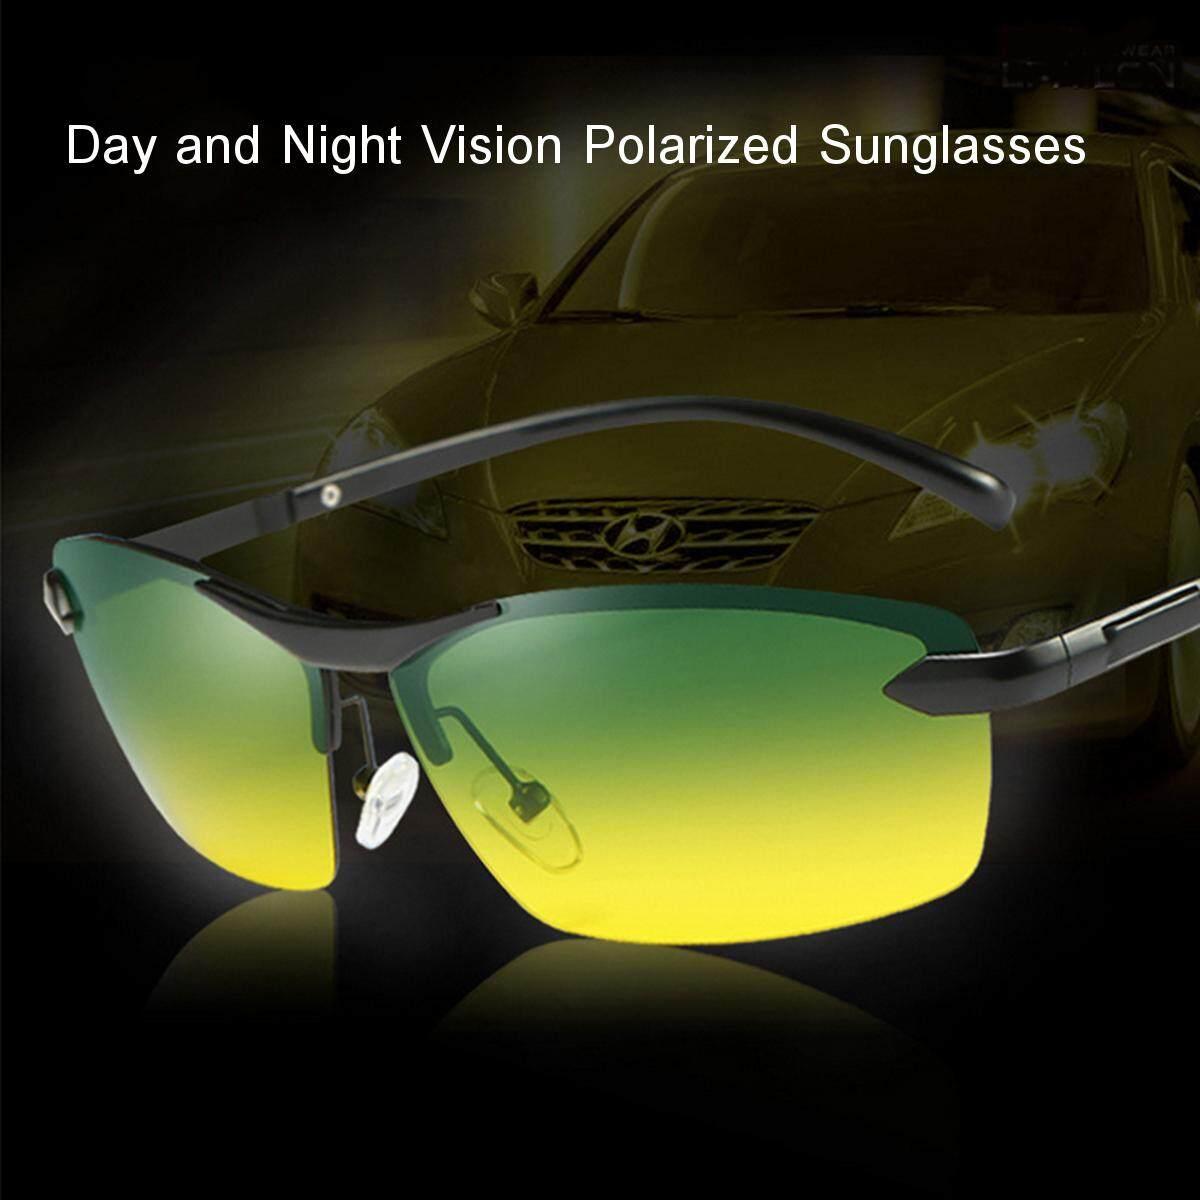 e0c87d22a22 UV Day Night Vision Men s Polarized Sunglasses Driving Pilot Mirror Sun  Glasses